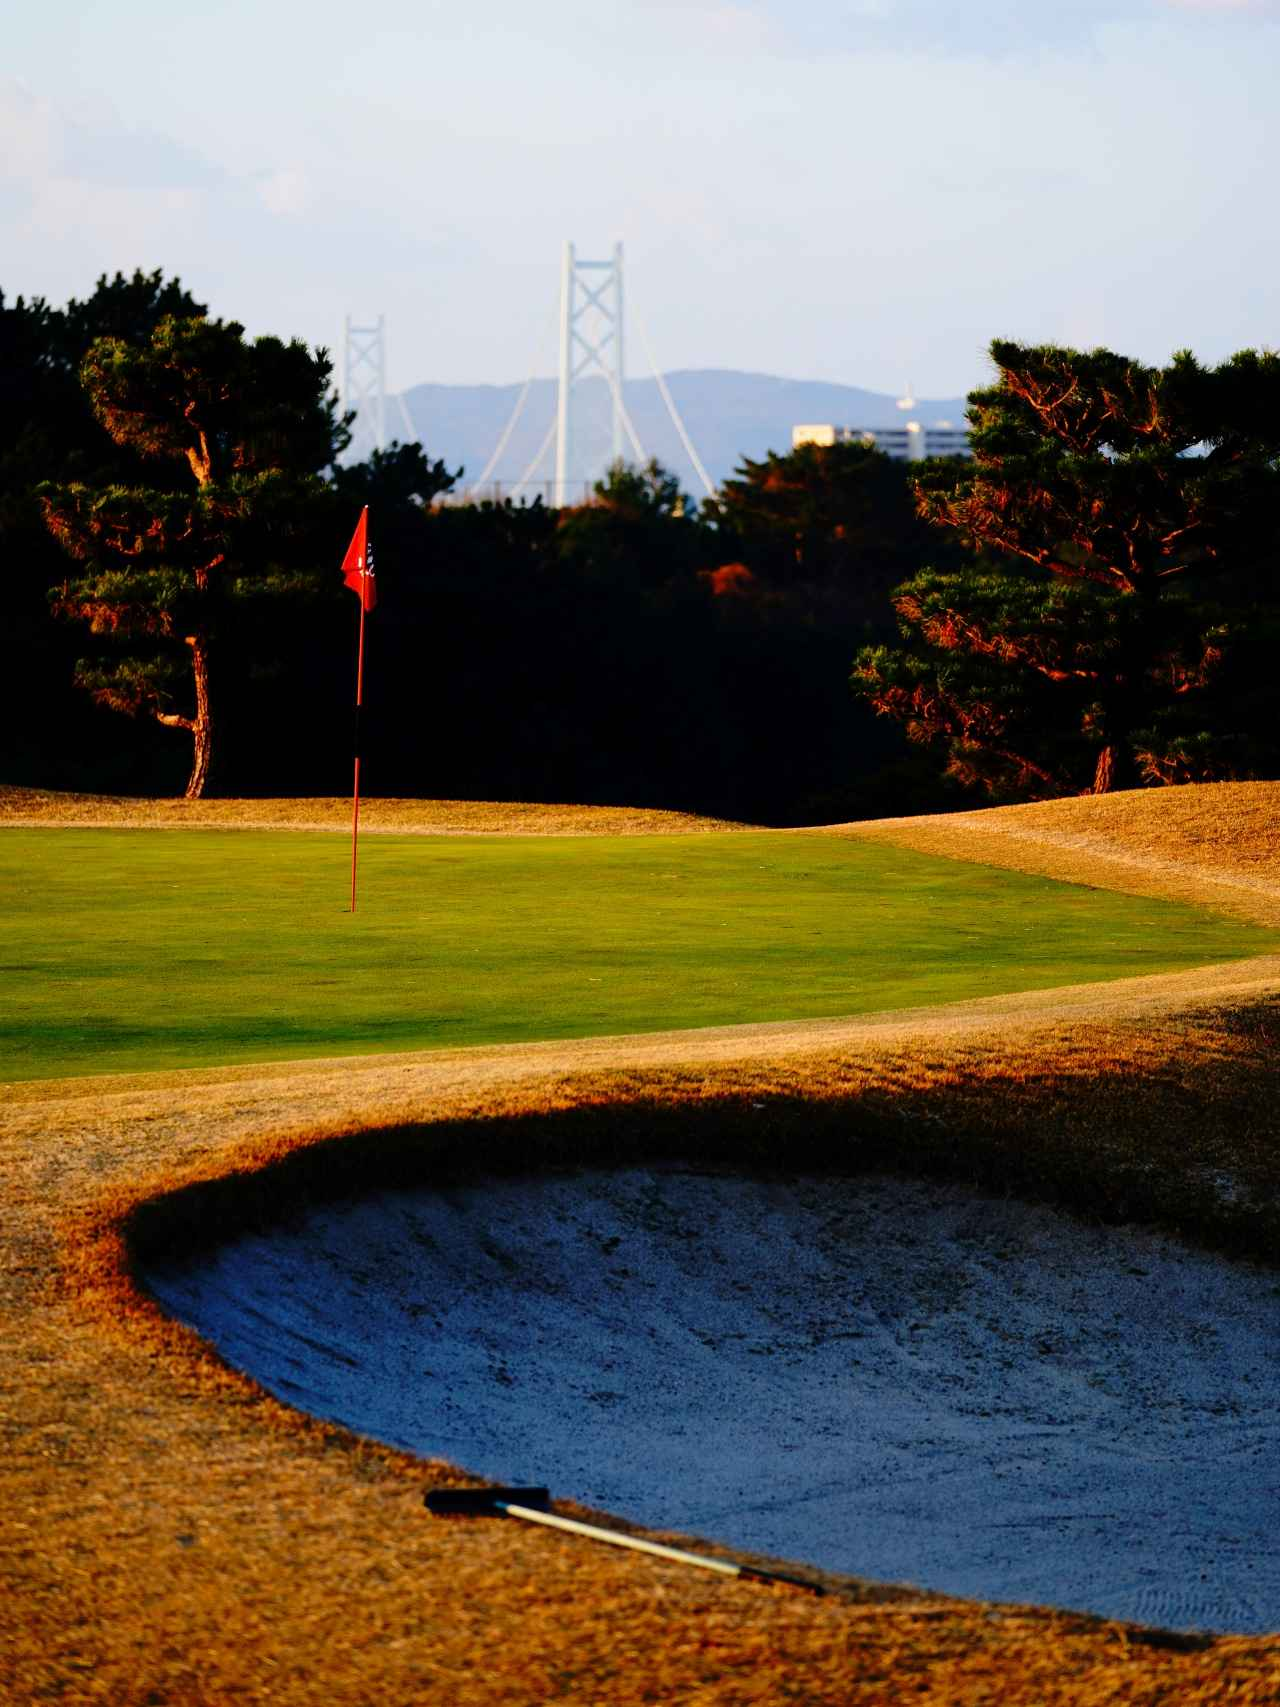 Images : 1番目の画像 - 垂水ゴルフ倶楽部 - ゴルフへ行こうWEB by ゴルフダイジェスト